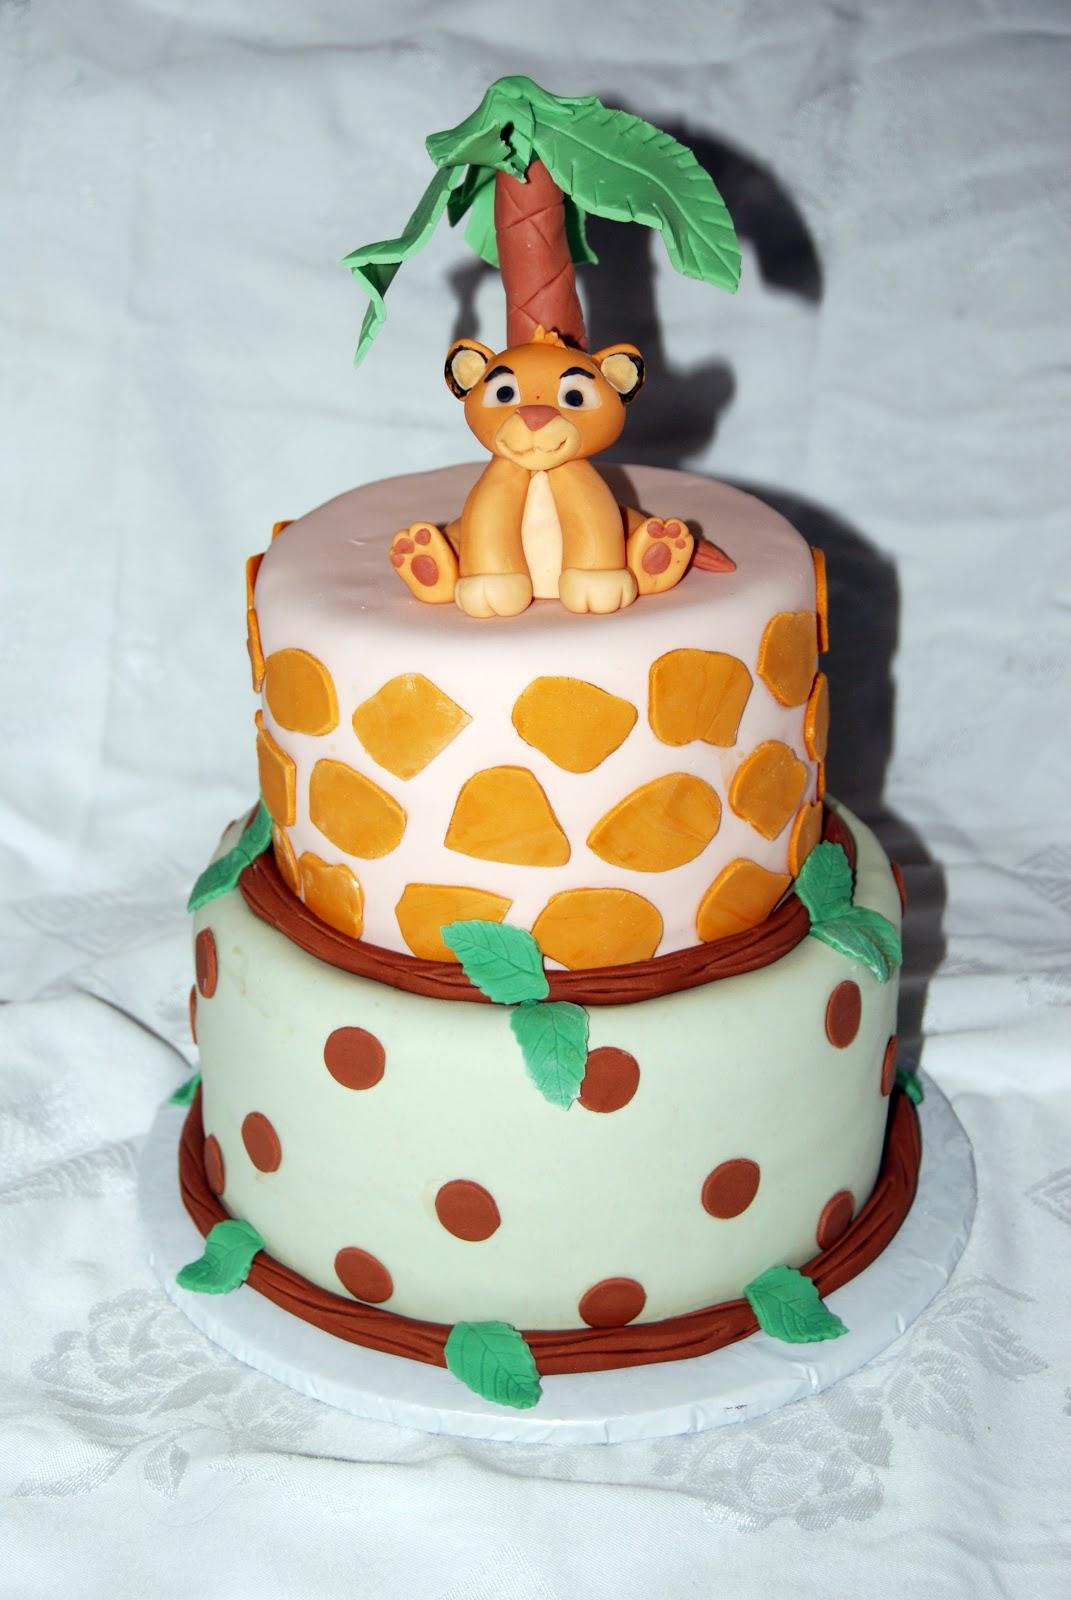 leelees cake abilities lion king baby cake